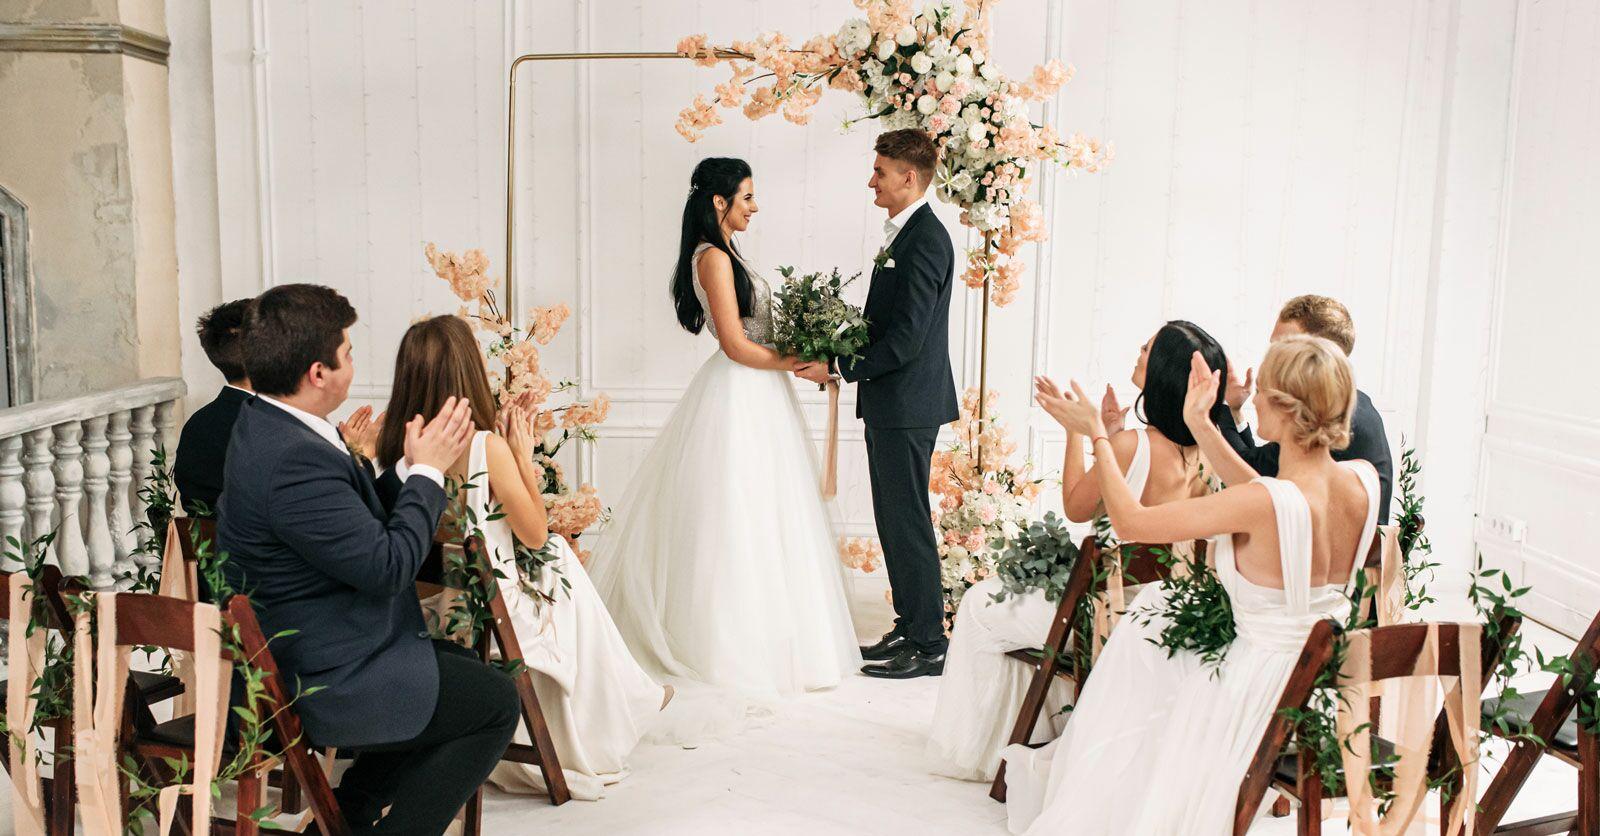 Micro Wedding Vs Minimony Vs Elopement How To Choose